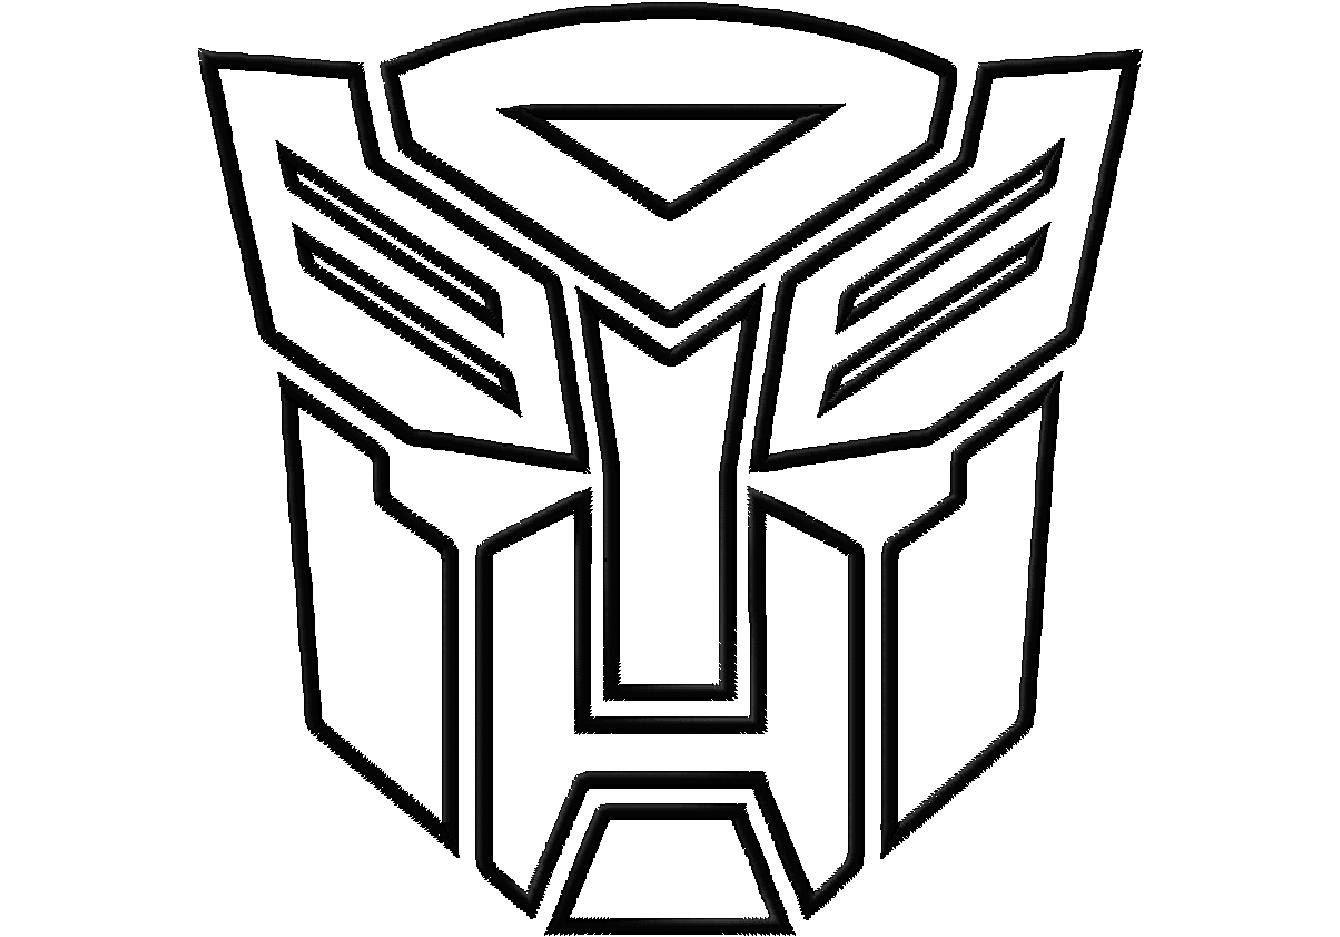 Pin Transformers Logo Stencil Ajilbabcom-Pin Transformers Logo Stencil Ajilbabcom Portal on Pinterest - ClipArt Best  - ClipArt Best-3